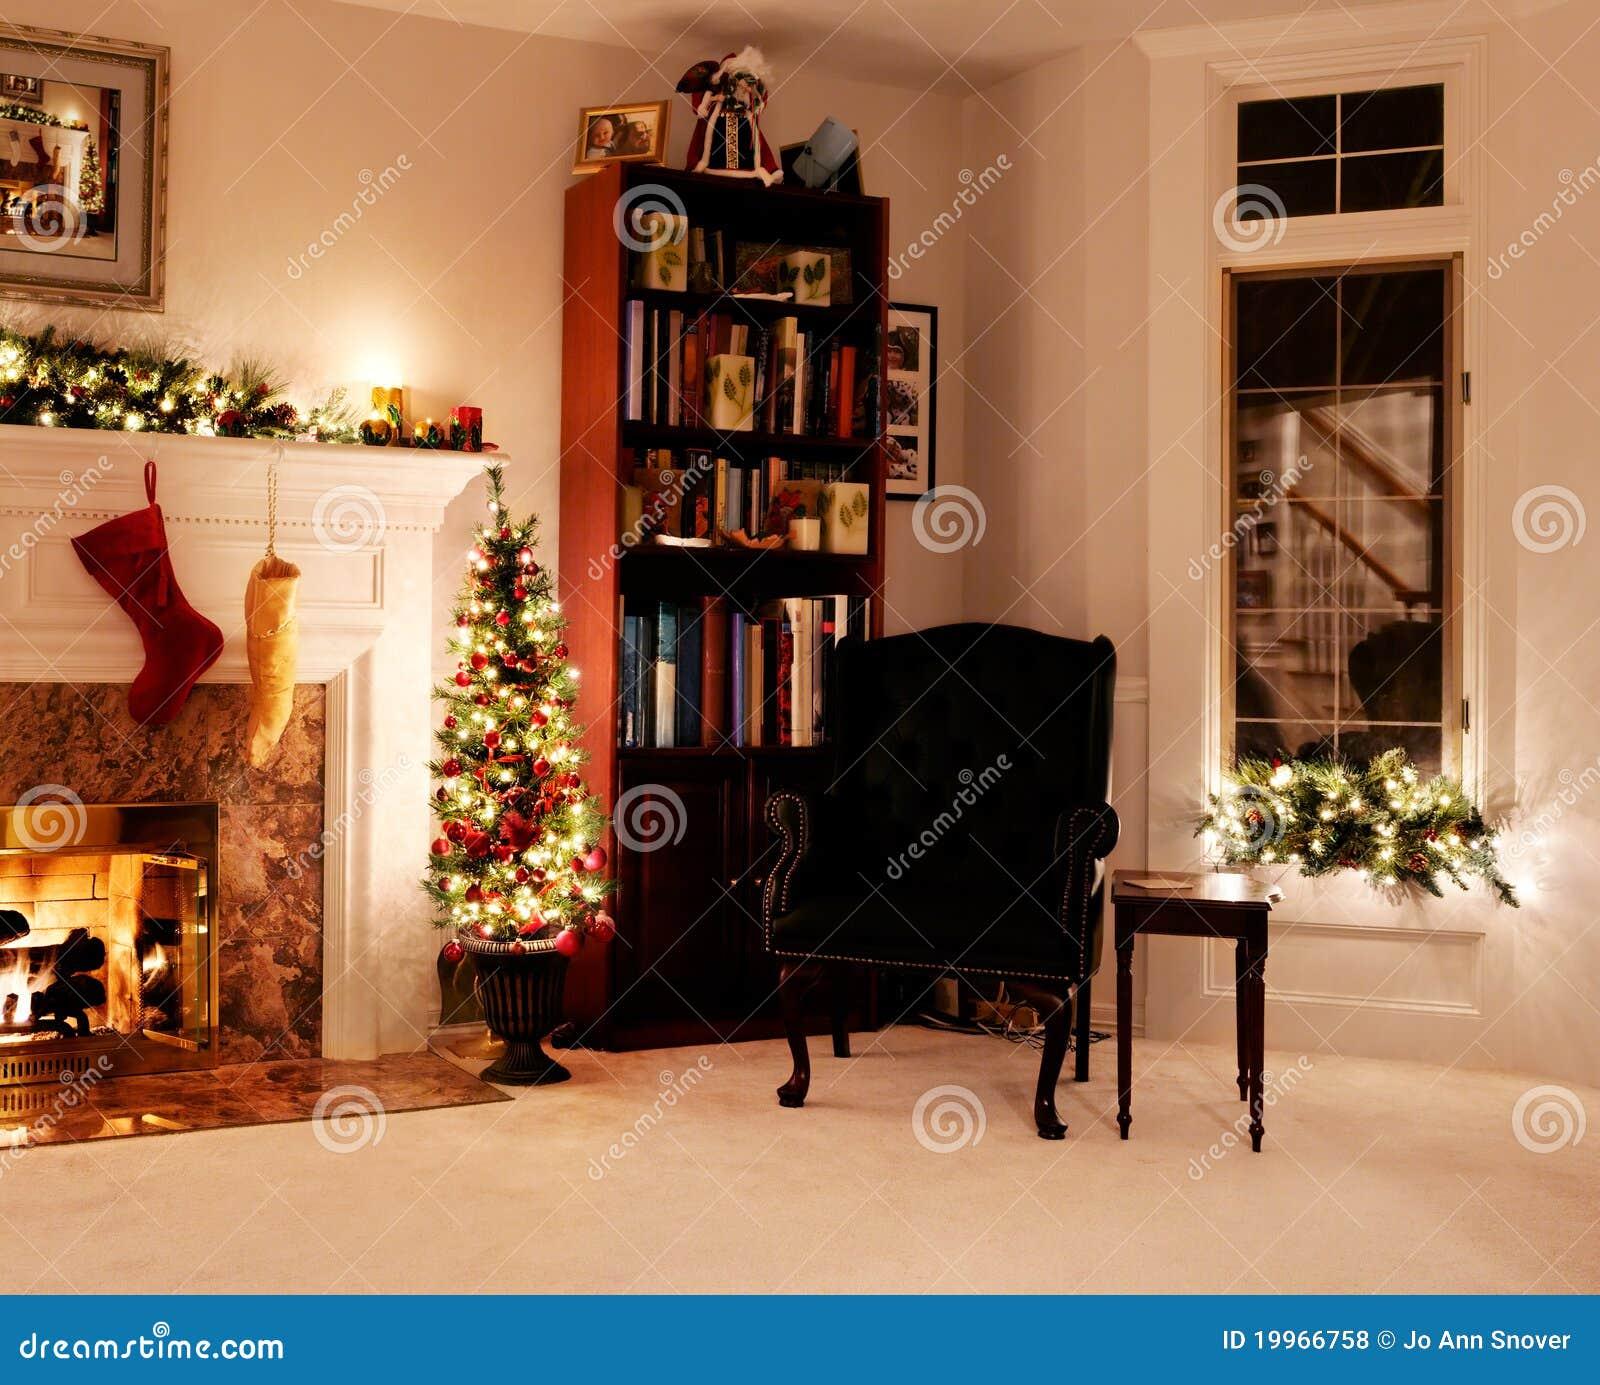 Christmas Living Room Holiday Lights Stock Photo Image Of Fireplace Black 19966758